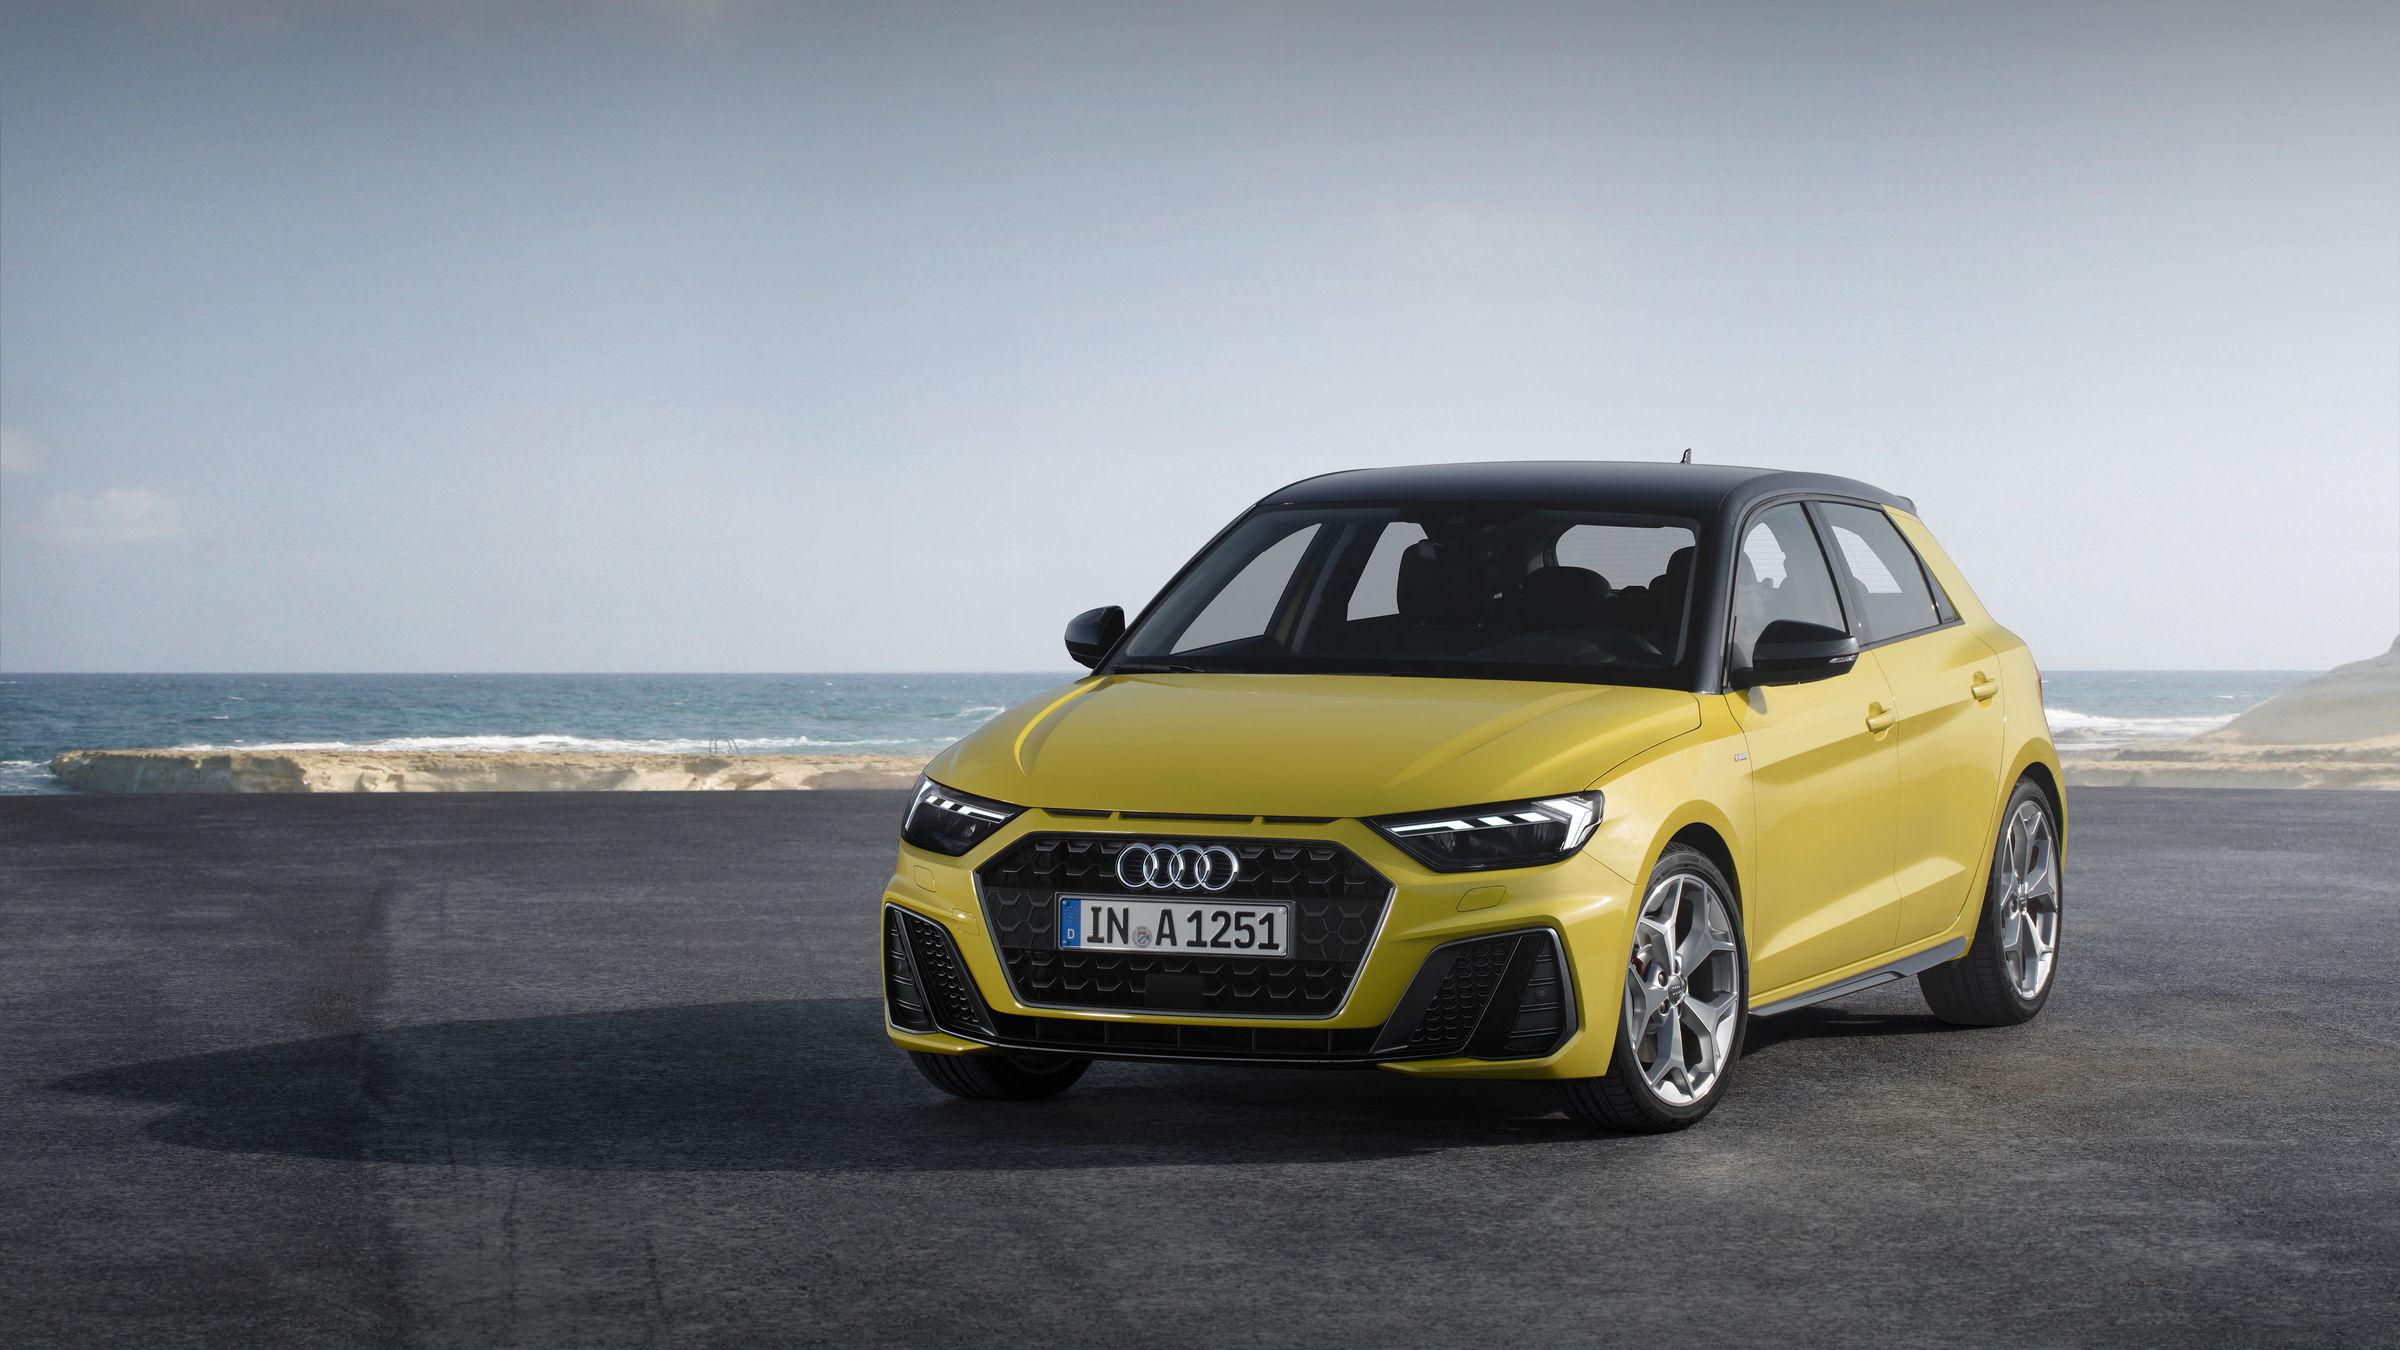 New Audi A1 Sportback Ideal Companion For An Urban Lifestyle Audi